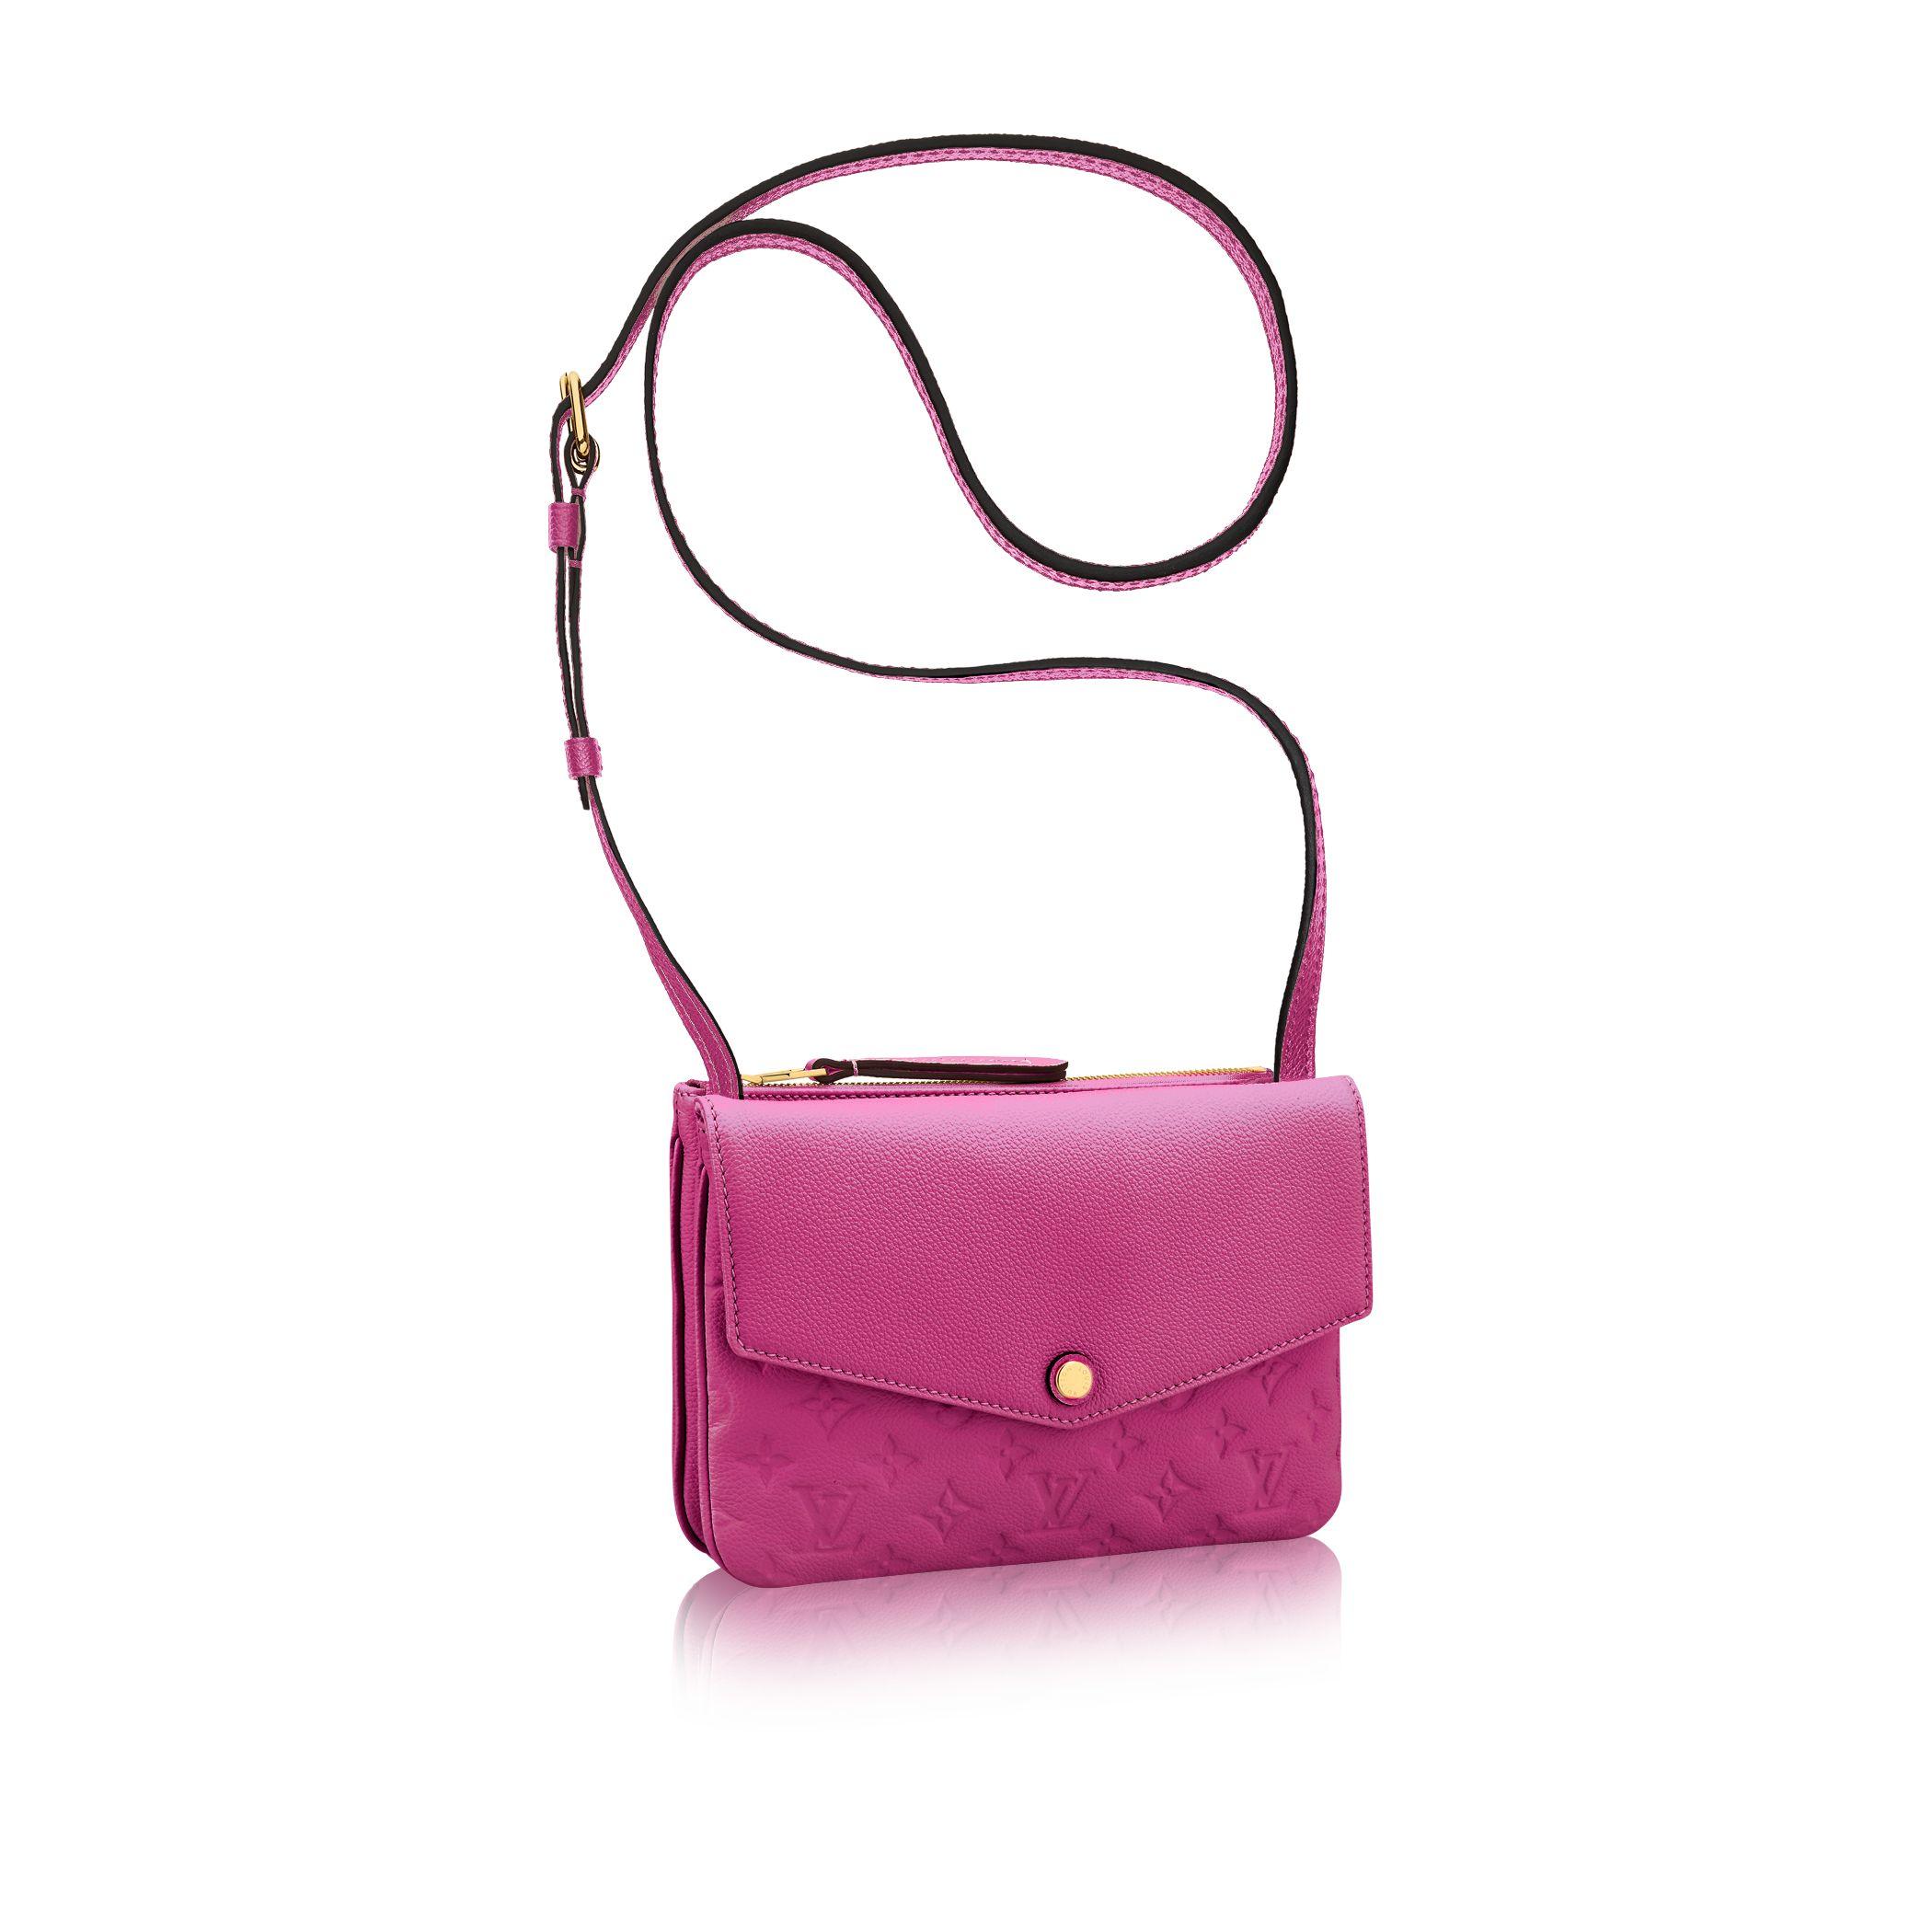 Cool Louis Vuitton Thompson Street Bag  Handbags  LOU51346  The RealReal